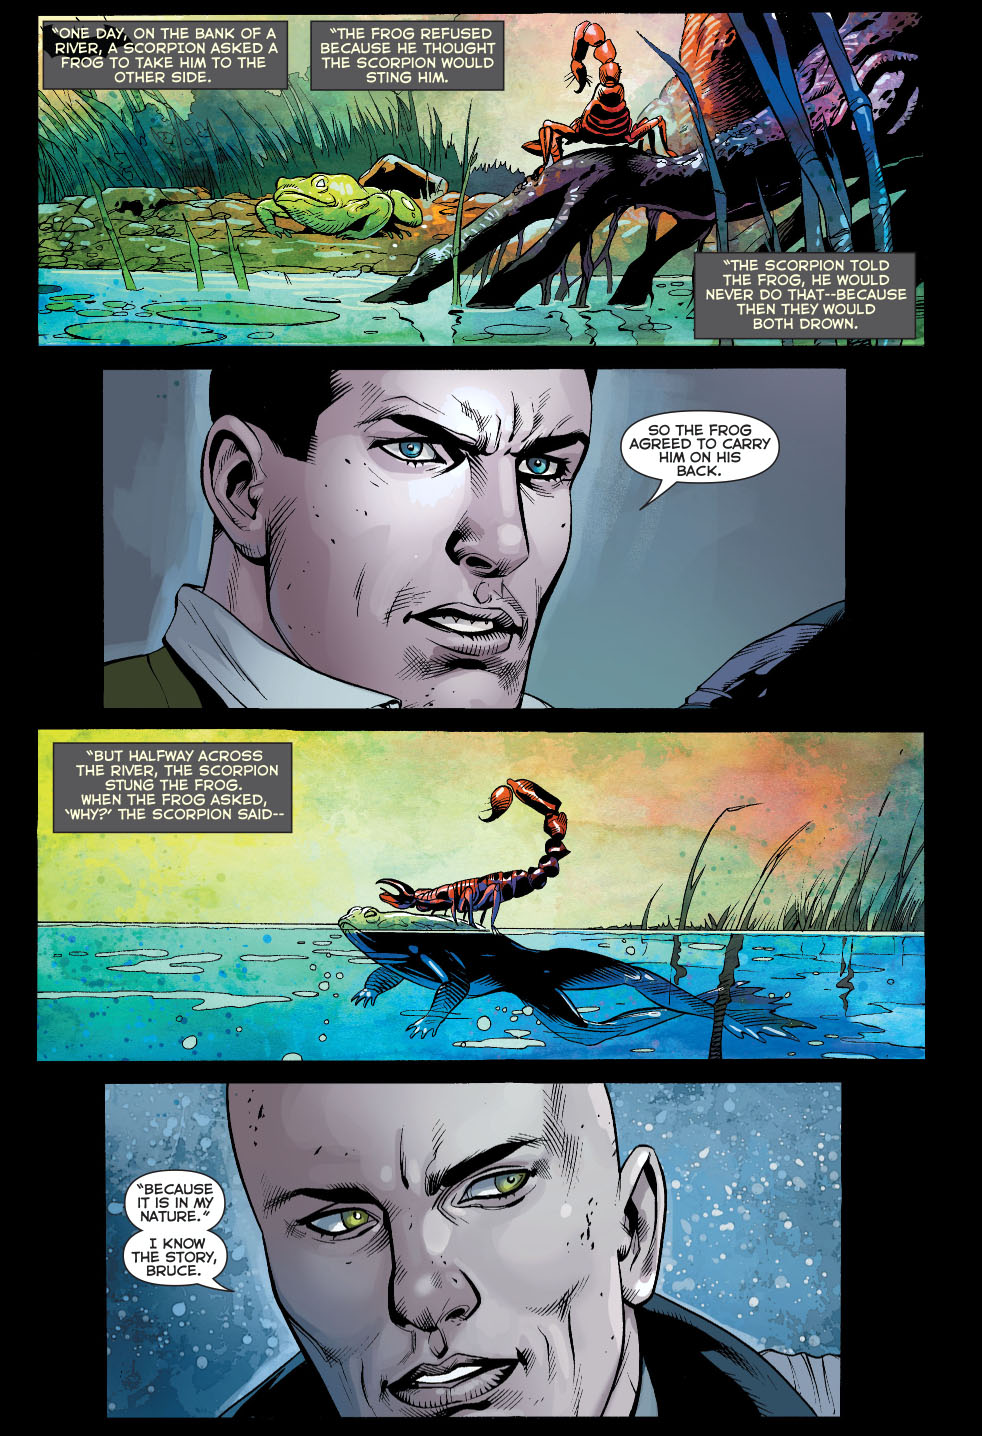 bruce wayne tells lex luthor a story 2